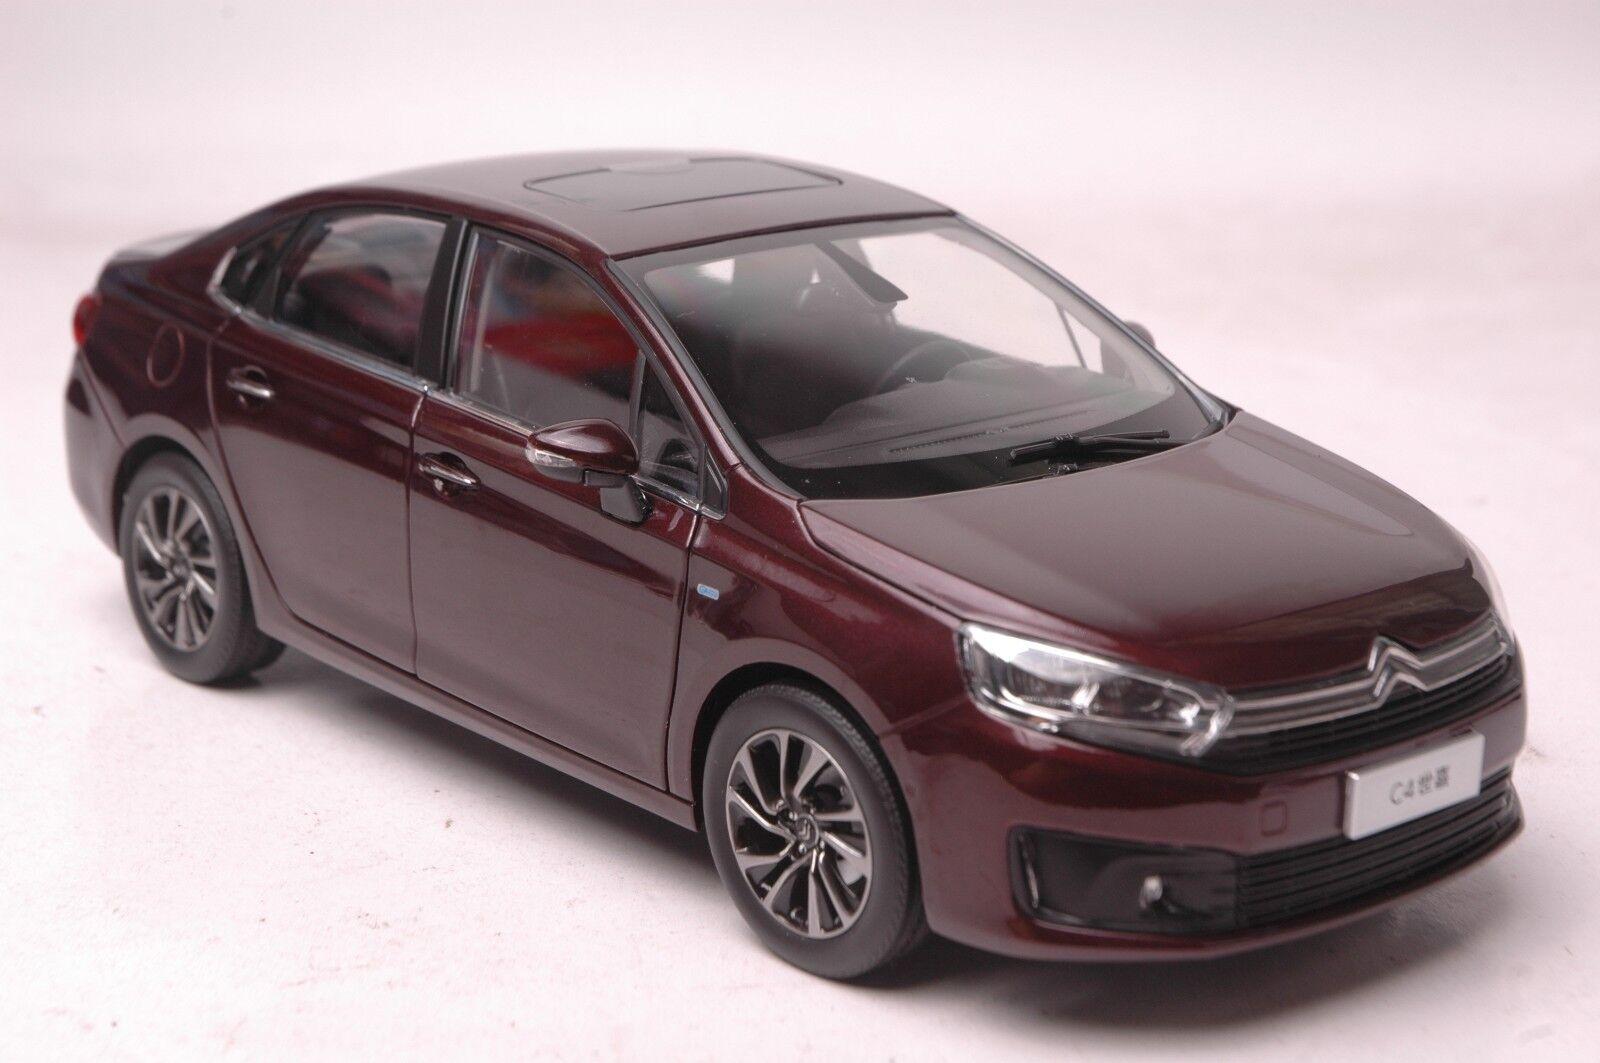 Citroen c4 2016 auto - modell im maßstab 1,18 rot